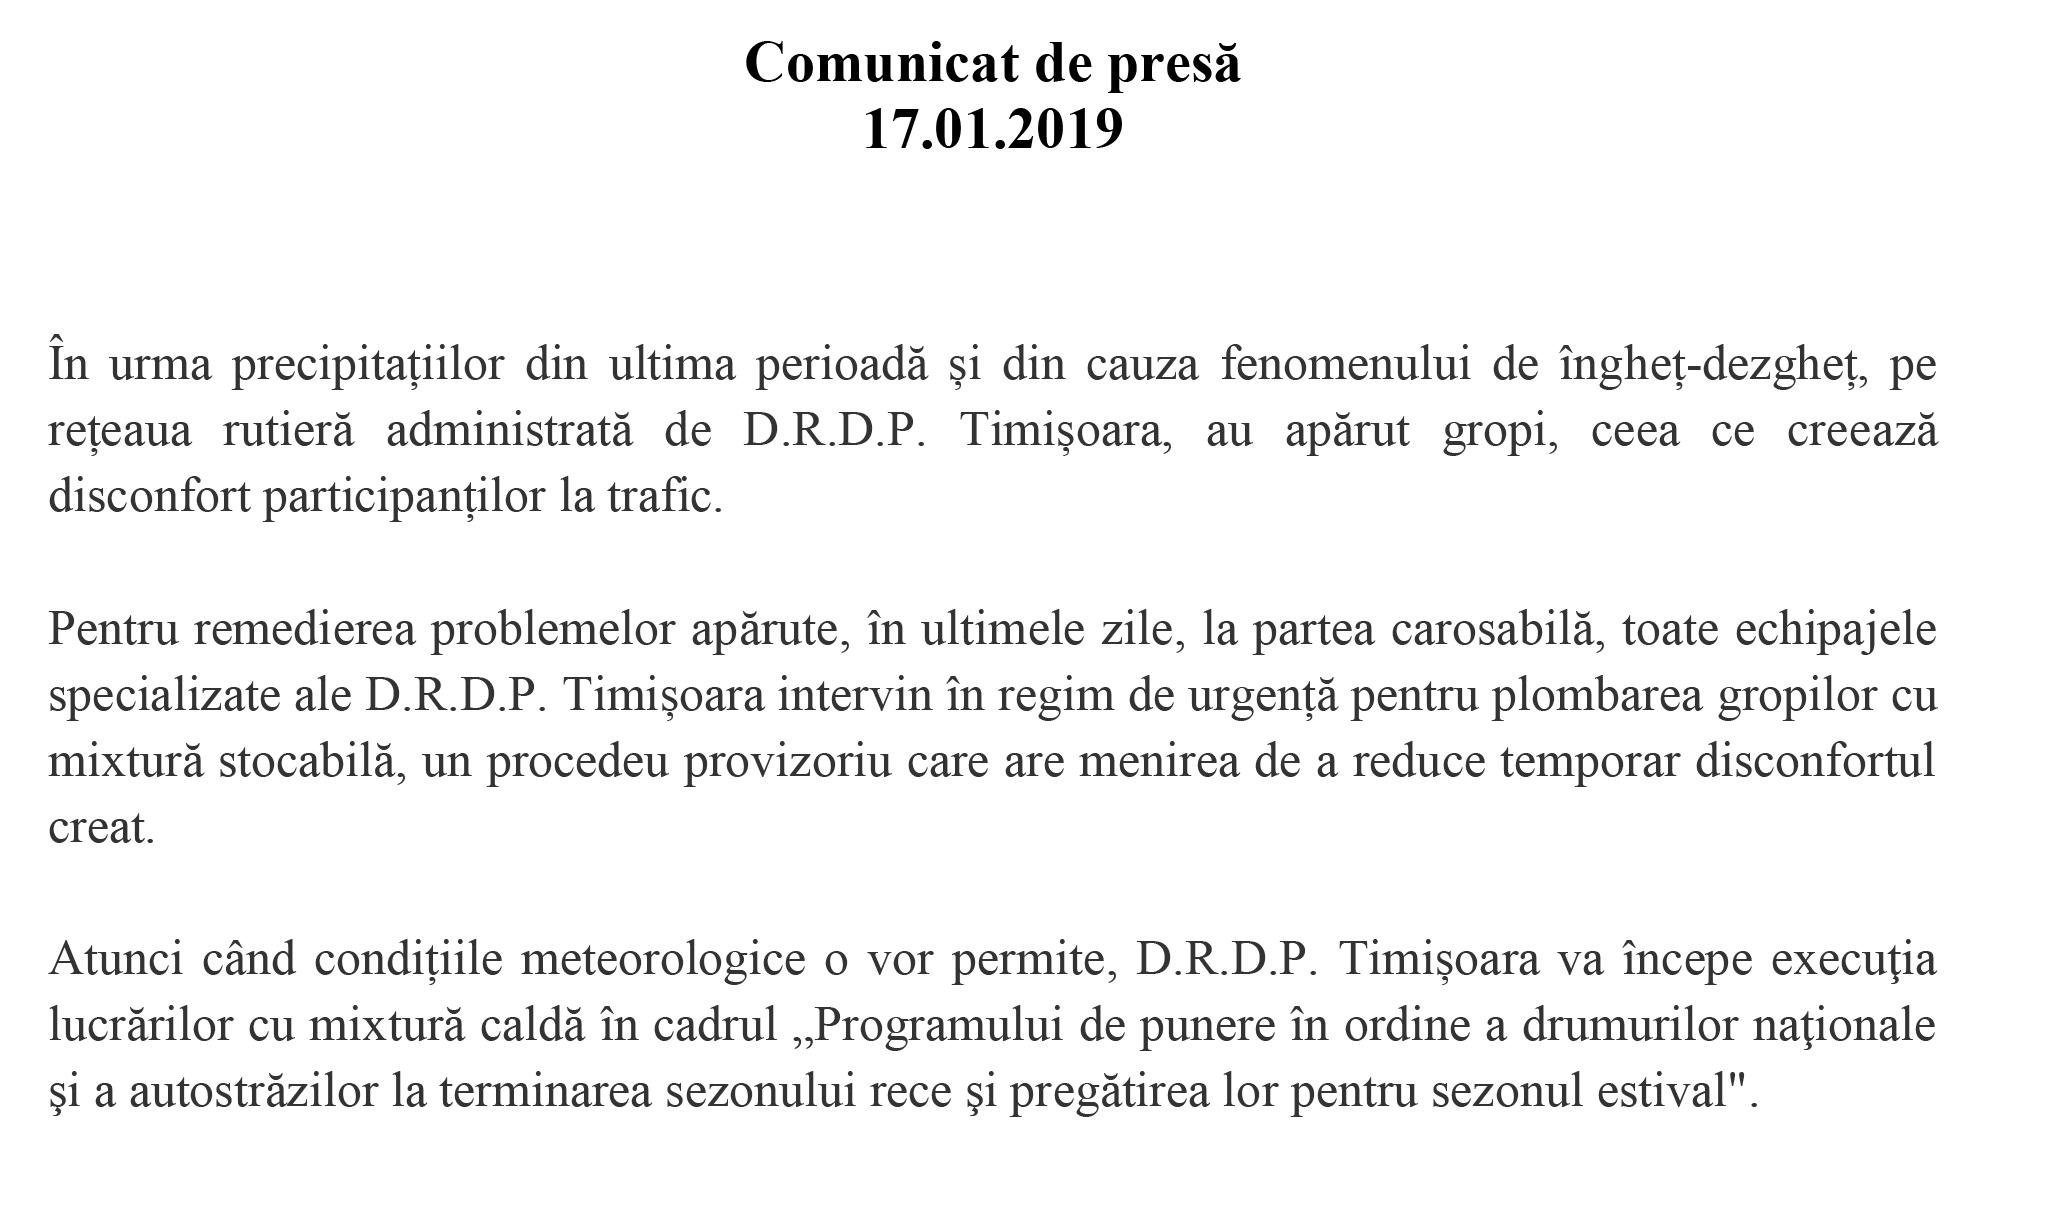 Comunicat de presă | D.R.D.P